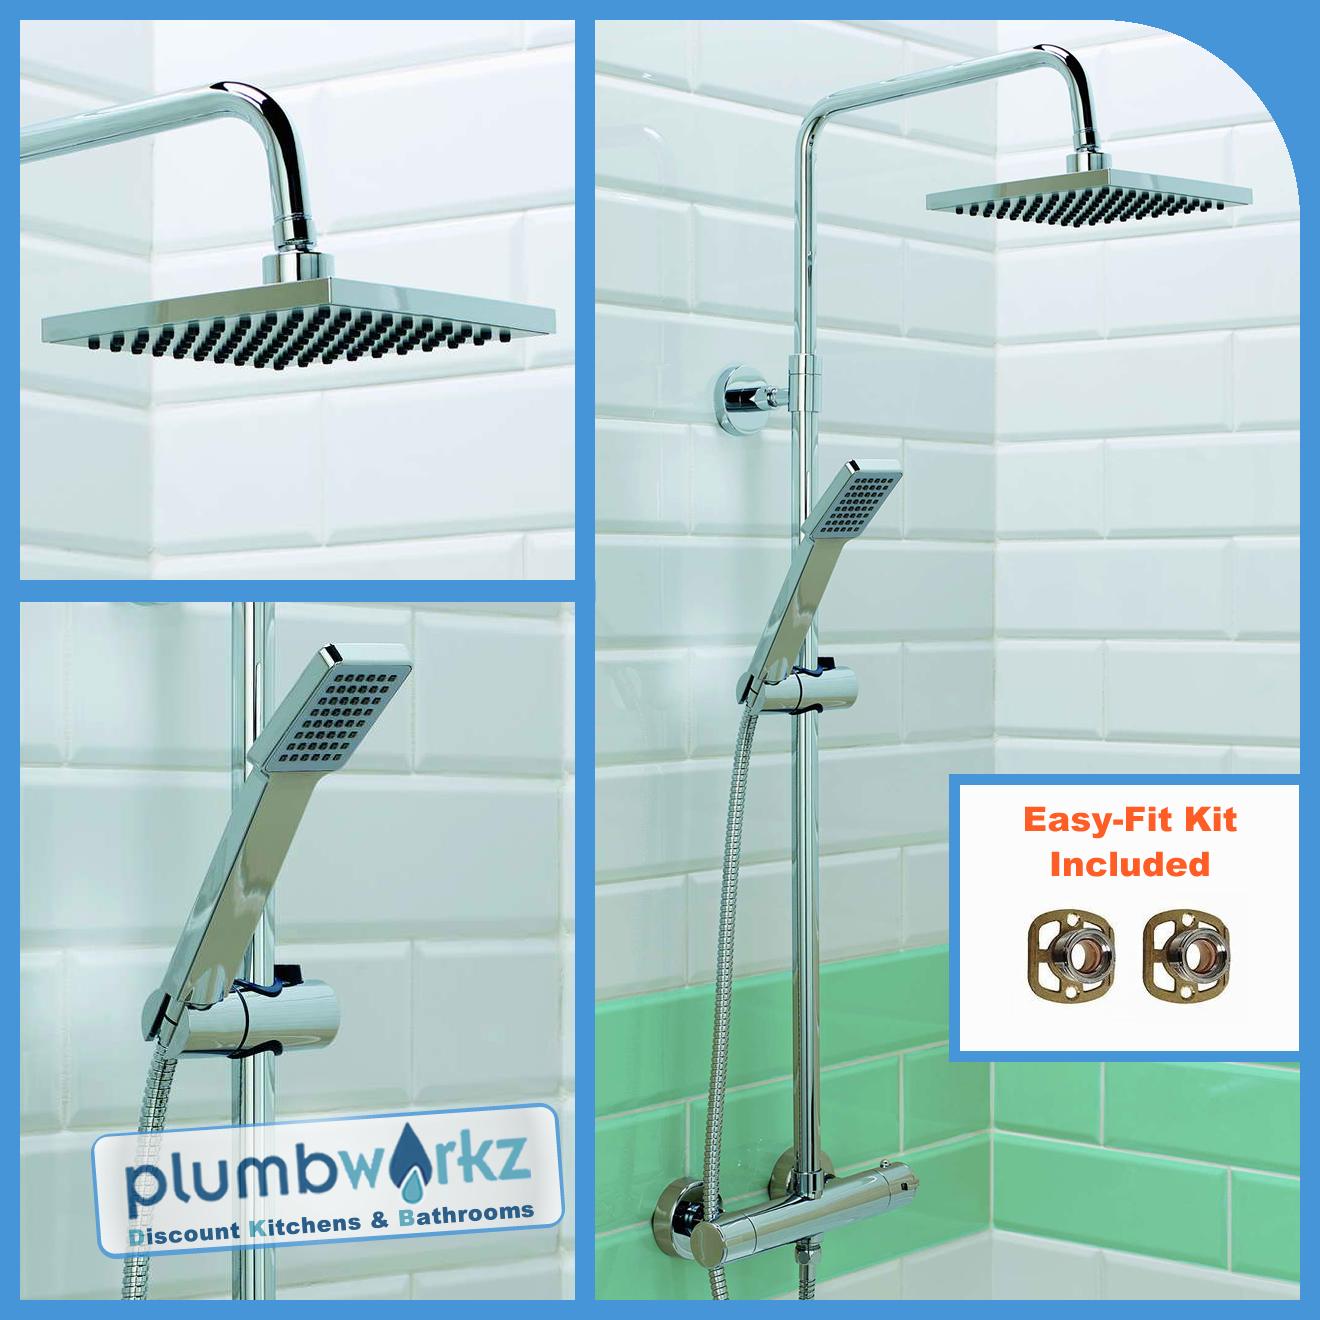 Fine Bar Shower Image Collection Bathtub Ideas Greenriverpedigree Info